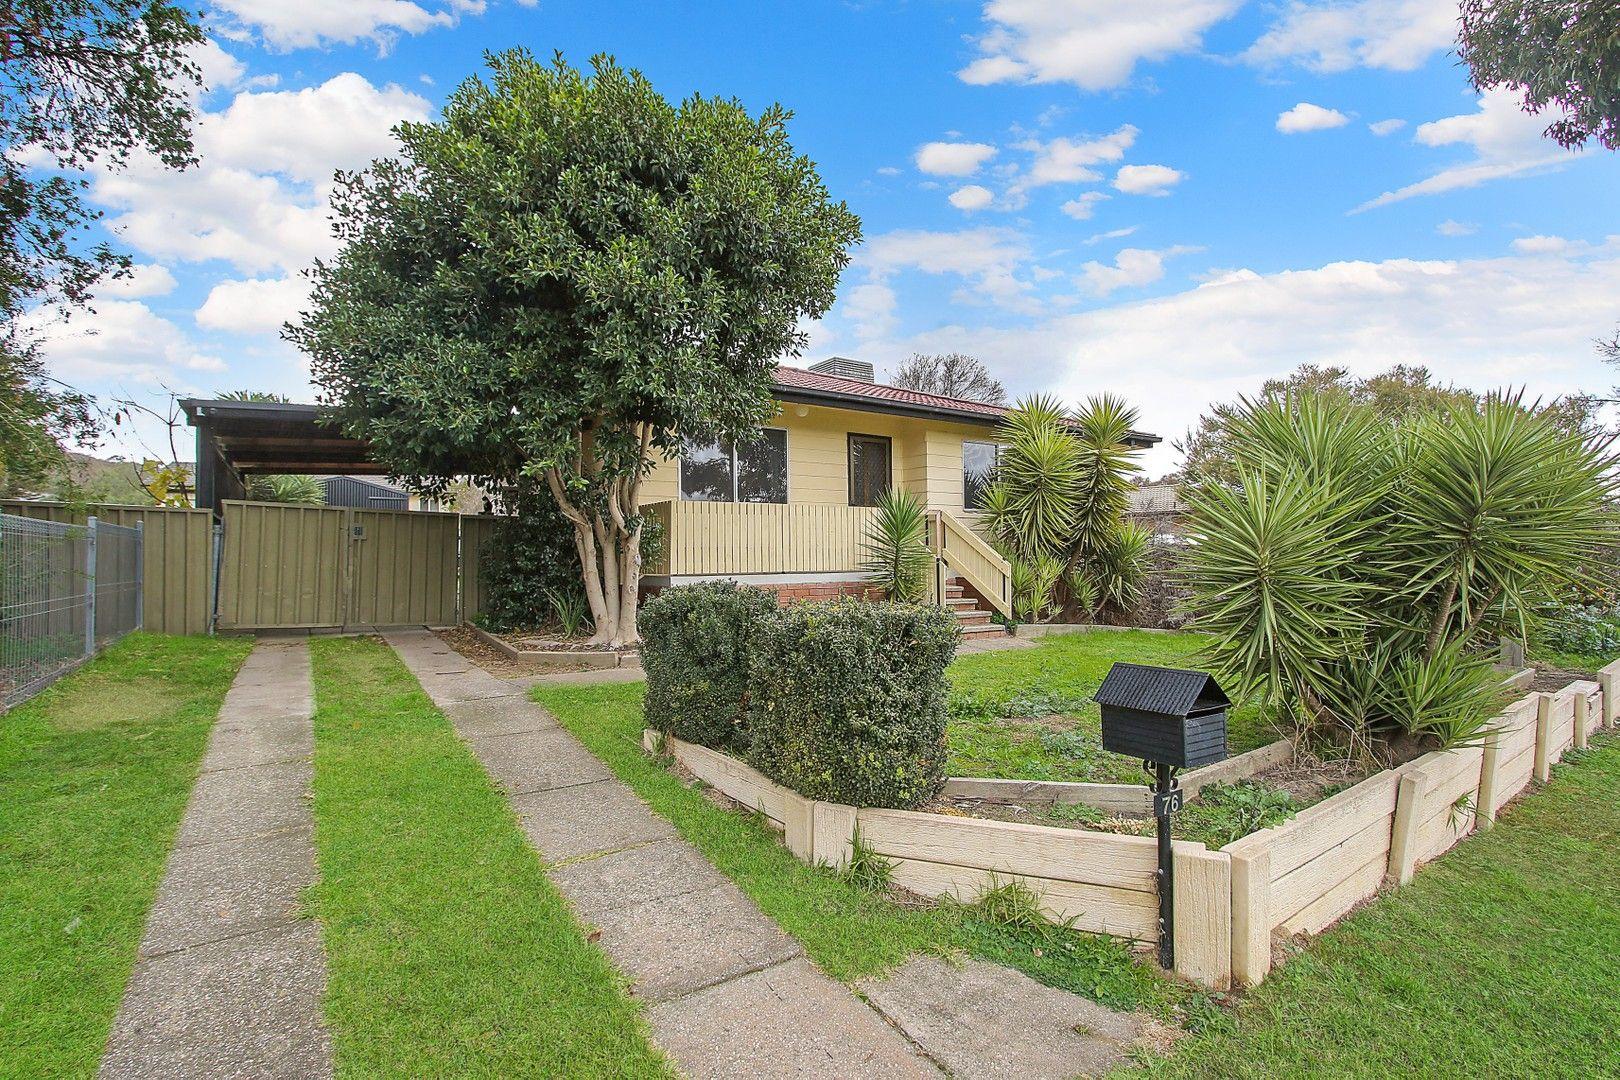 76 Jacaranda Street, West Albury NSW 2640, Image 0